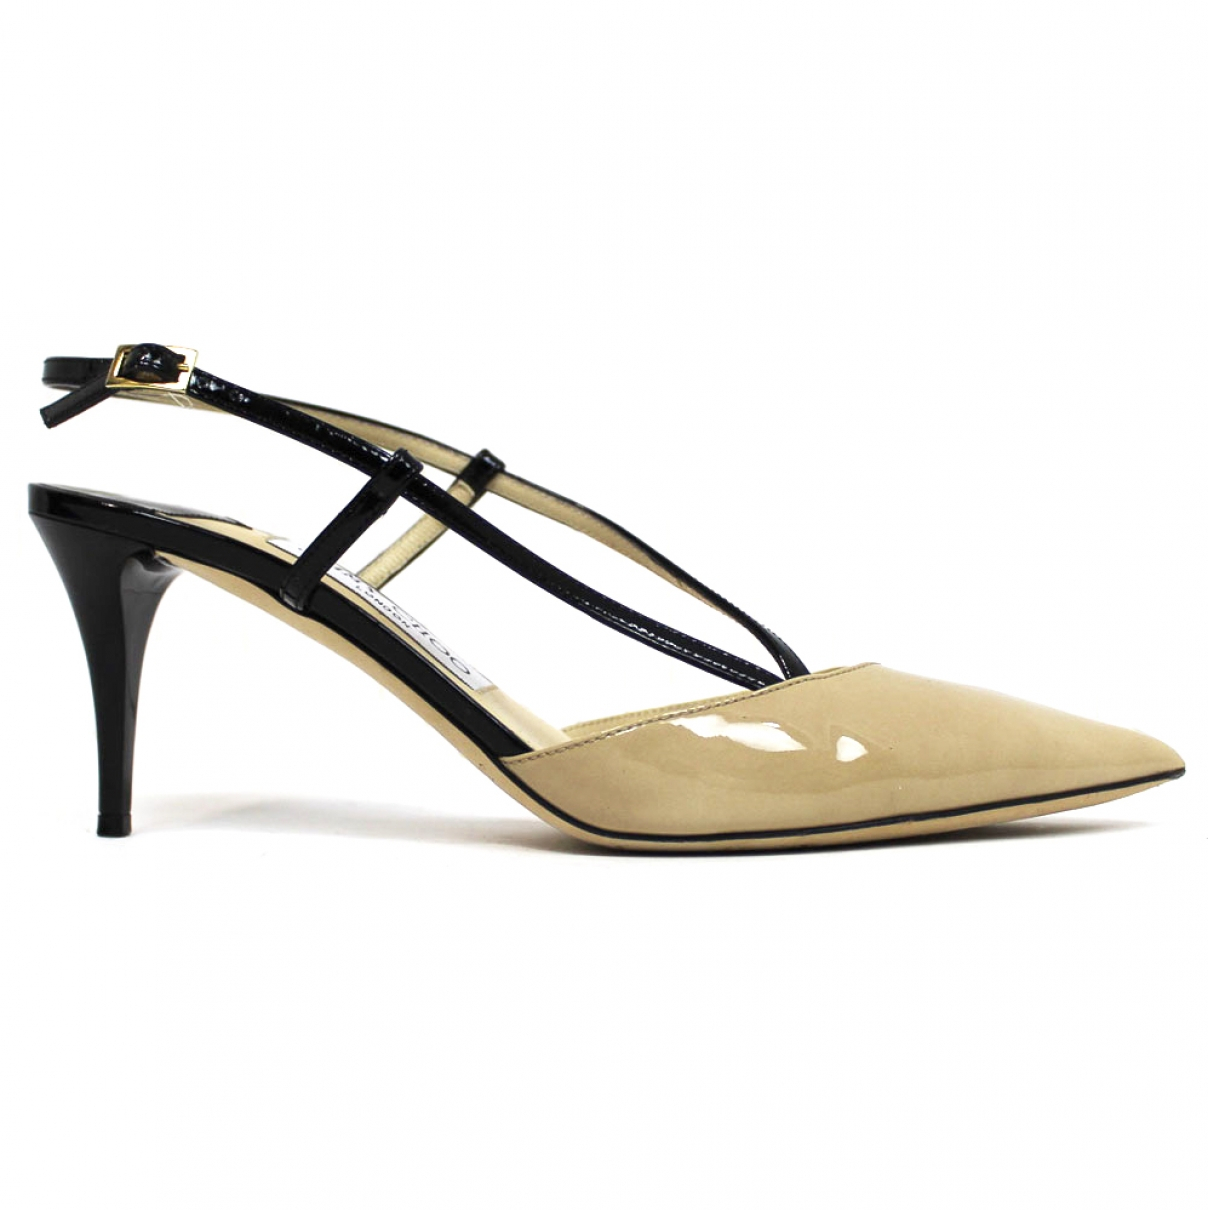 Jimmy Choo \N Black Patent leather Sandals for Women 38 EU